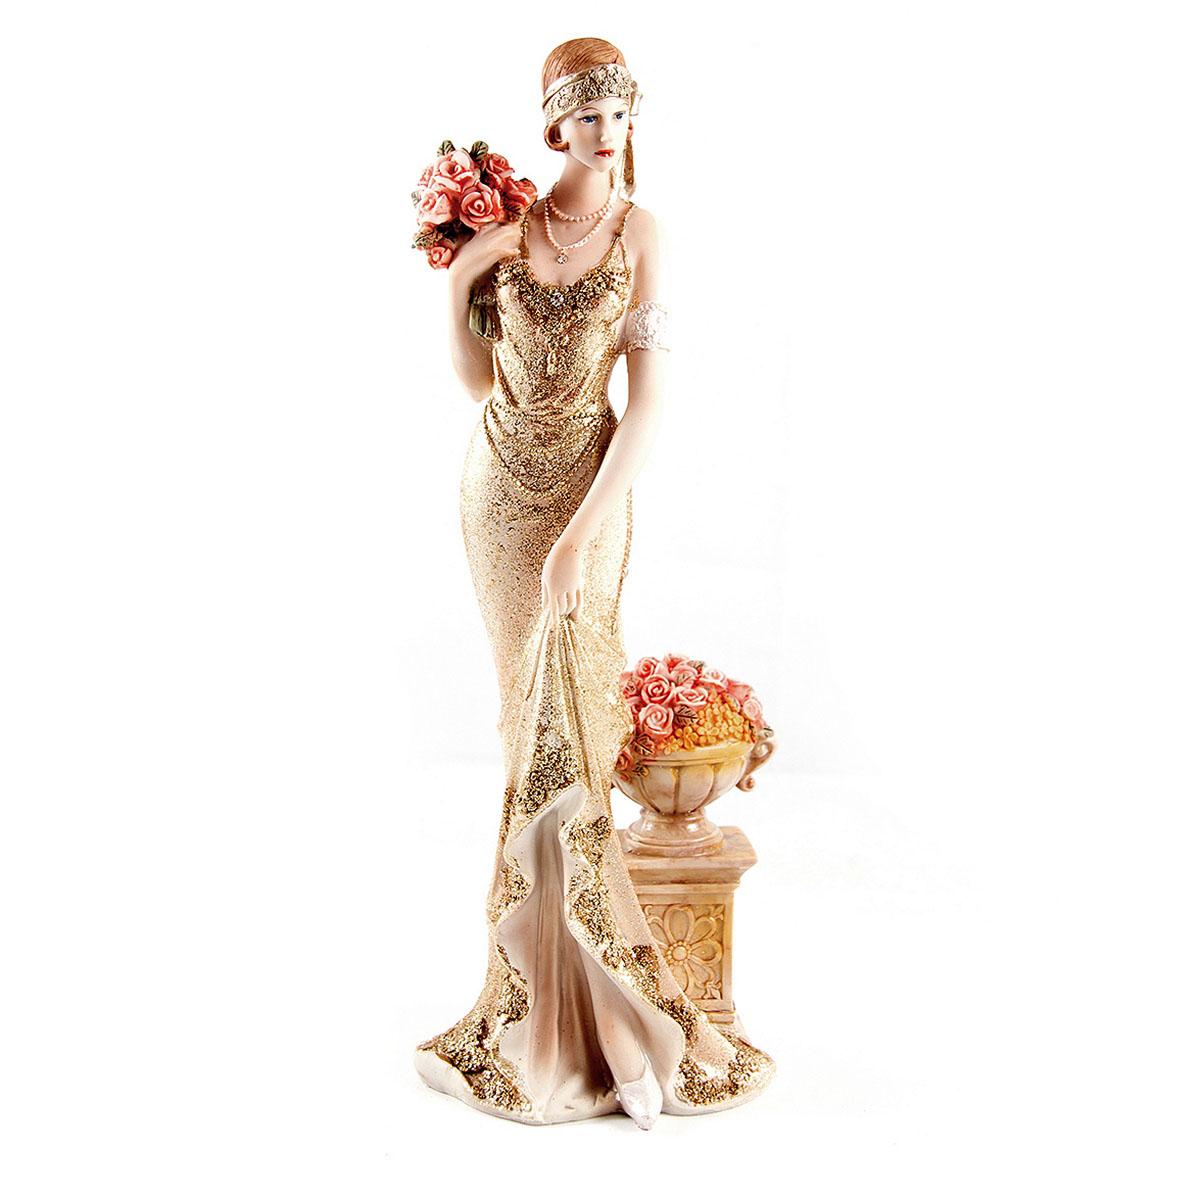 Статуэтка Русские Подарки Мисс Нежность, 13 х 10 х 34 см статуэтка русские подарки африканка 6 х 11 х 20 см